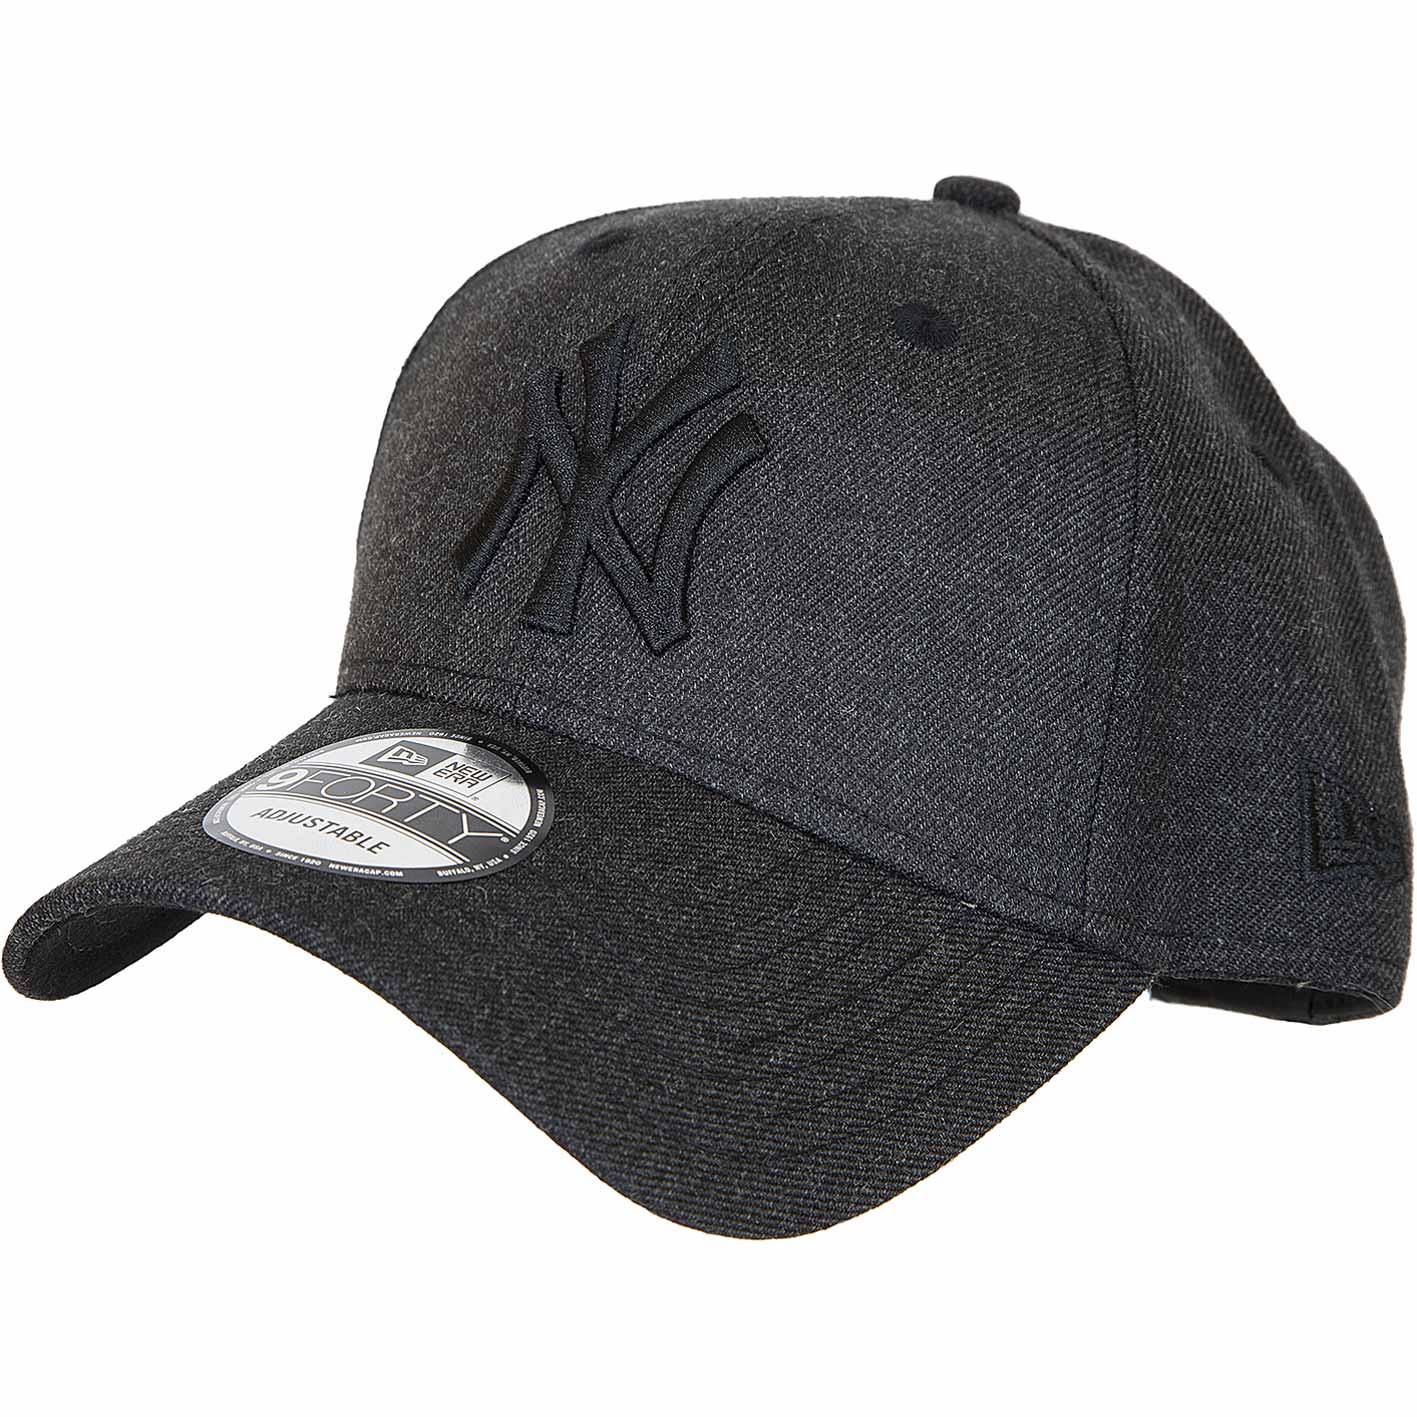 ☆ New Era 9Forty Snapback Cap Heather Essential NY Yankees schwarz ... 529f8a4f5af